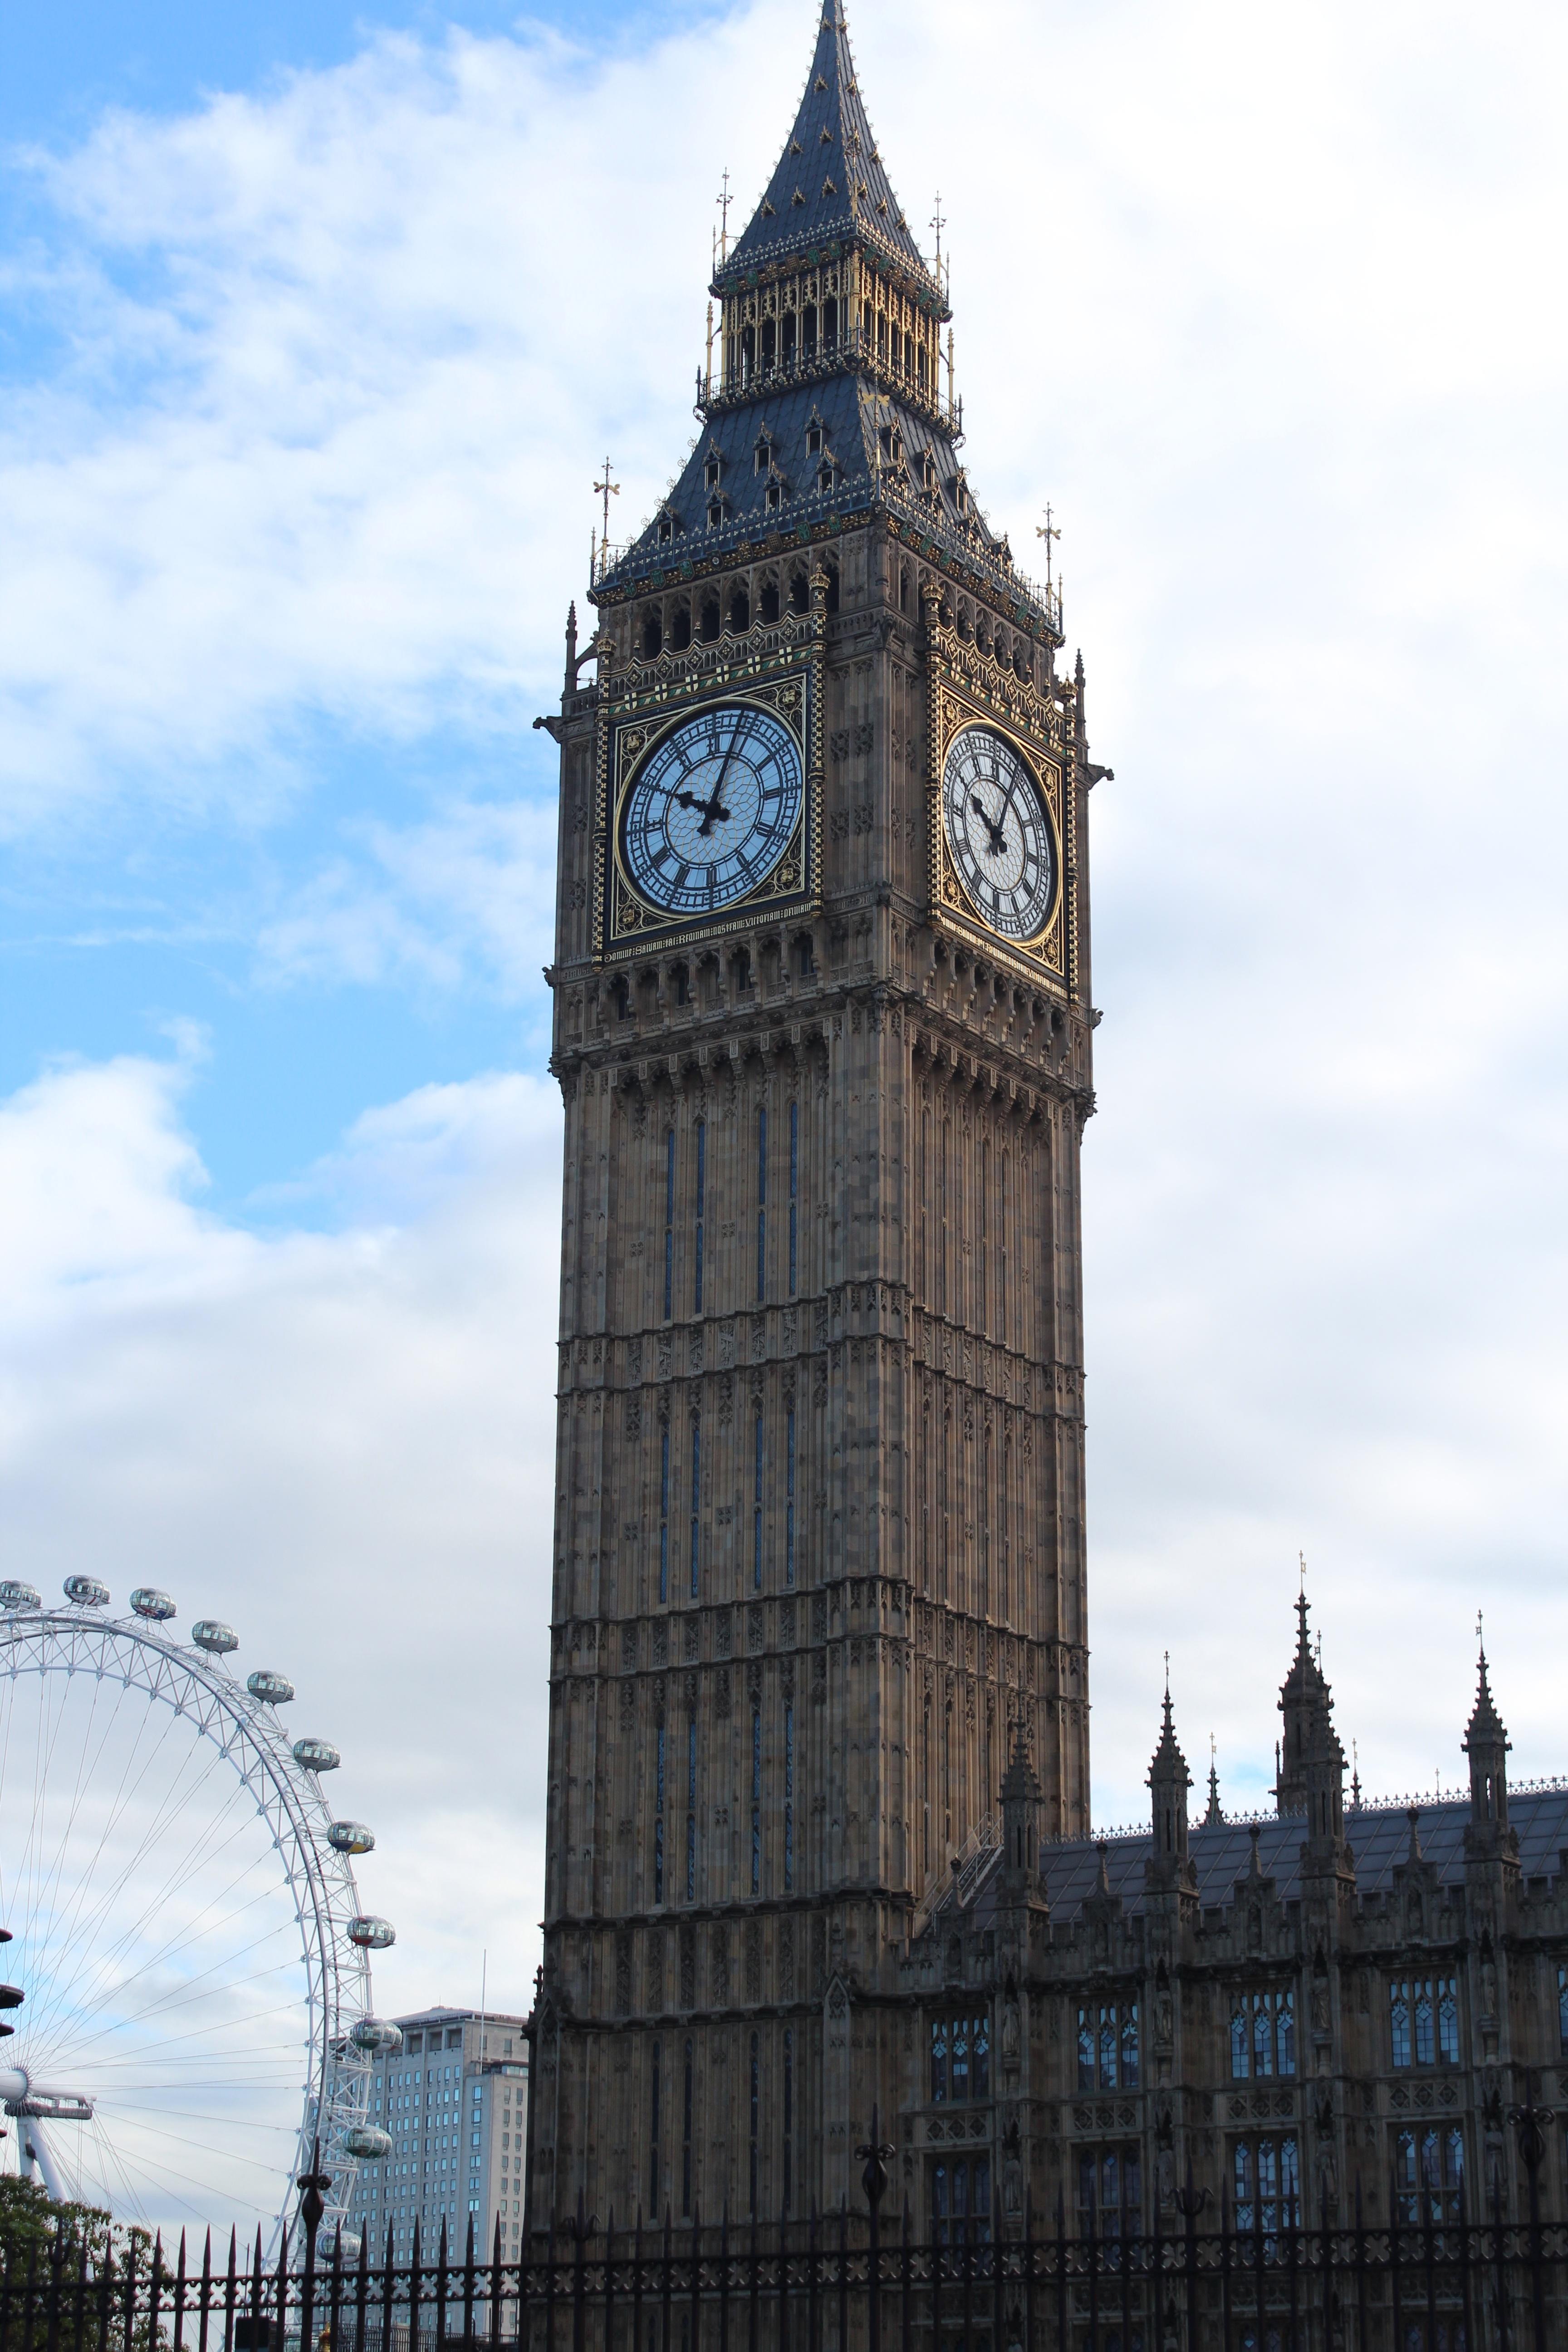 Tower Of London Buildings